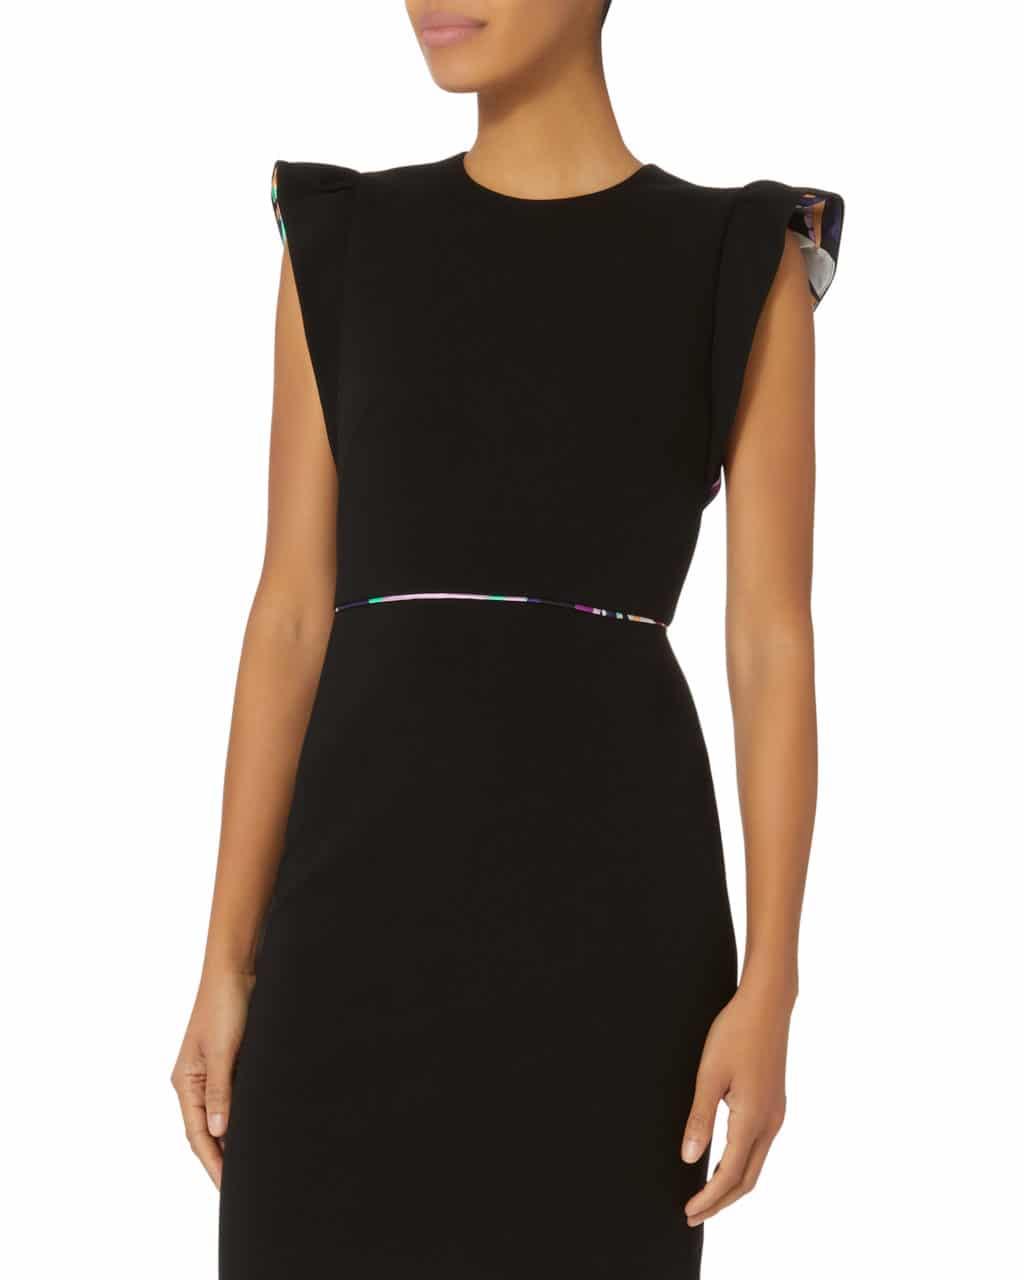 Emilio Pucci Ruffle Sleeve Black Dress